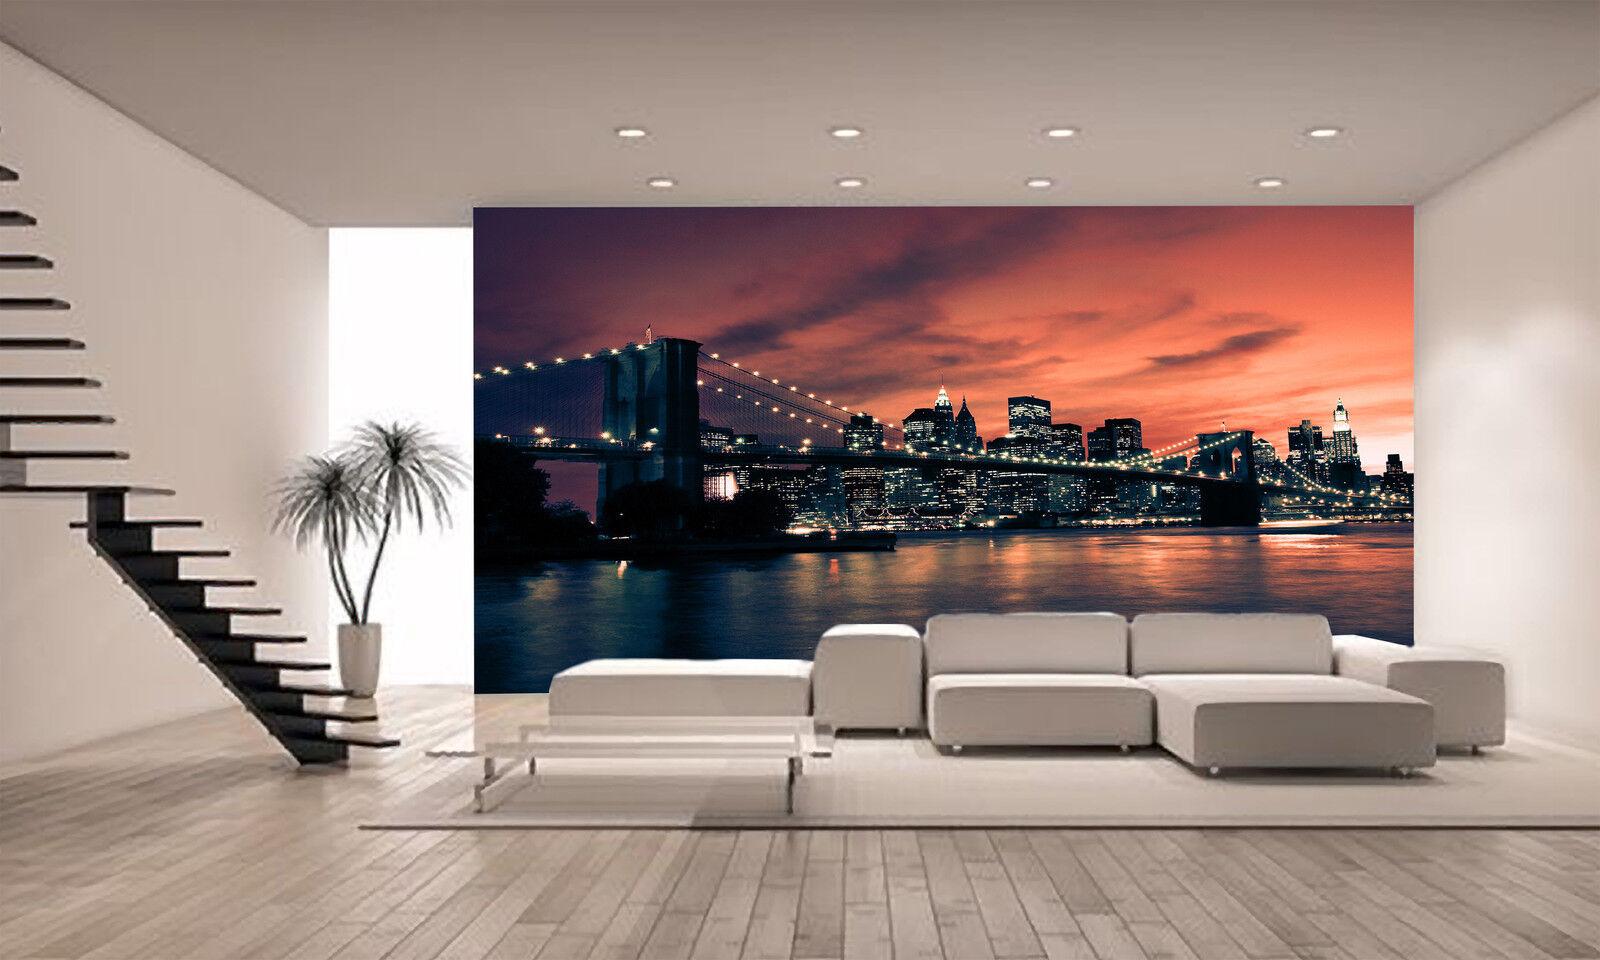 Brooklyn Bridge Wall Mural Photo Wallpaper GIANT DECOR Paper Poster Free Paste